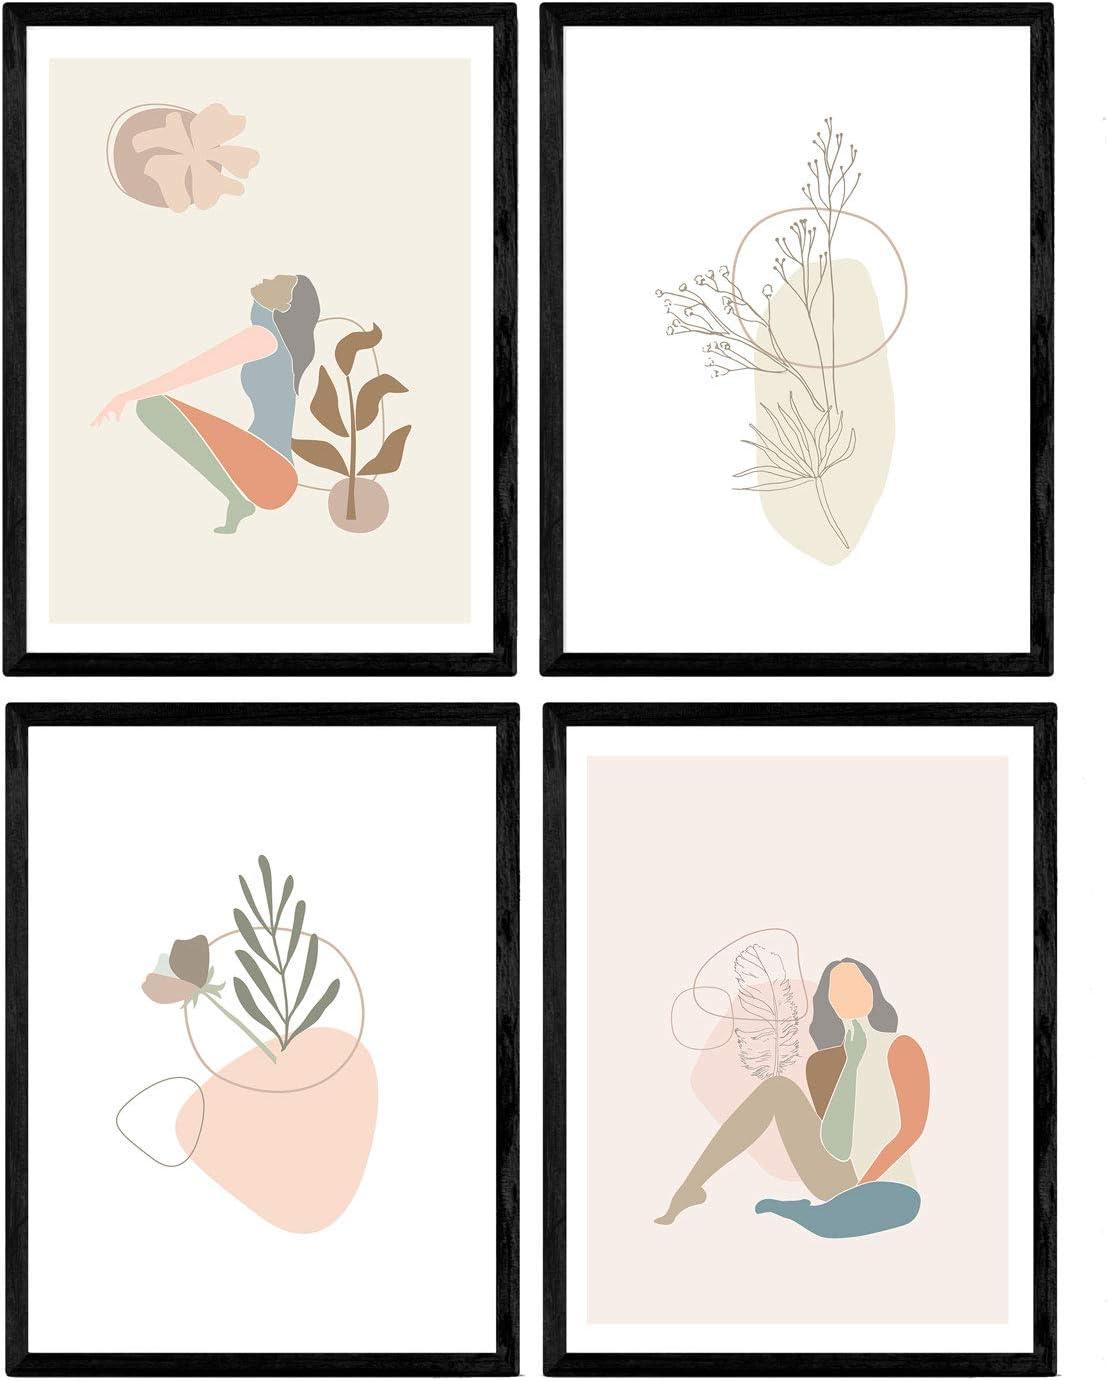 Nacnic Set of 1 - Unframed 8x11 inch Size - 250g Paper - Women Posing, Scandinvian Style, Free Spirited Pink, Blue, Green Orange Gray, Olive Branch, Flower